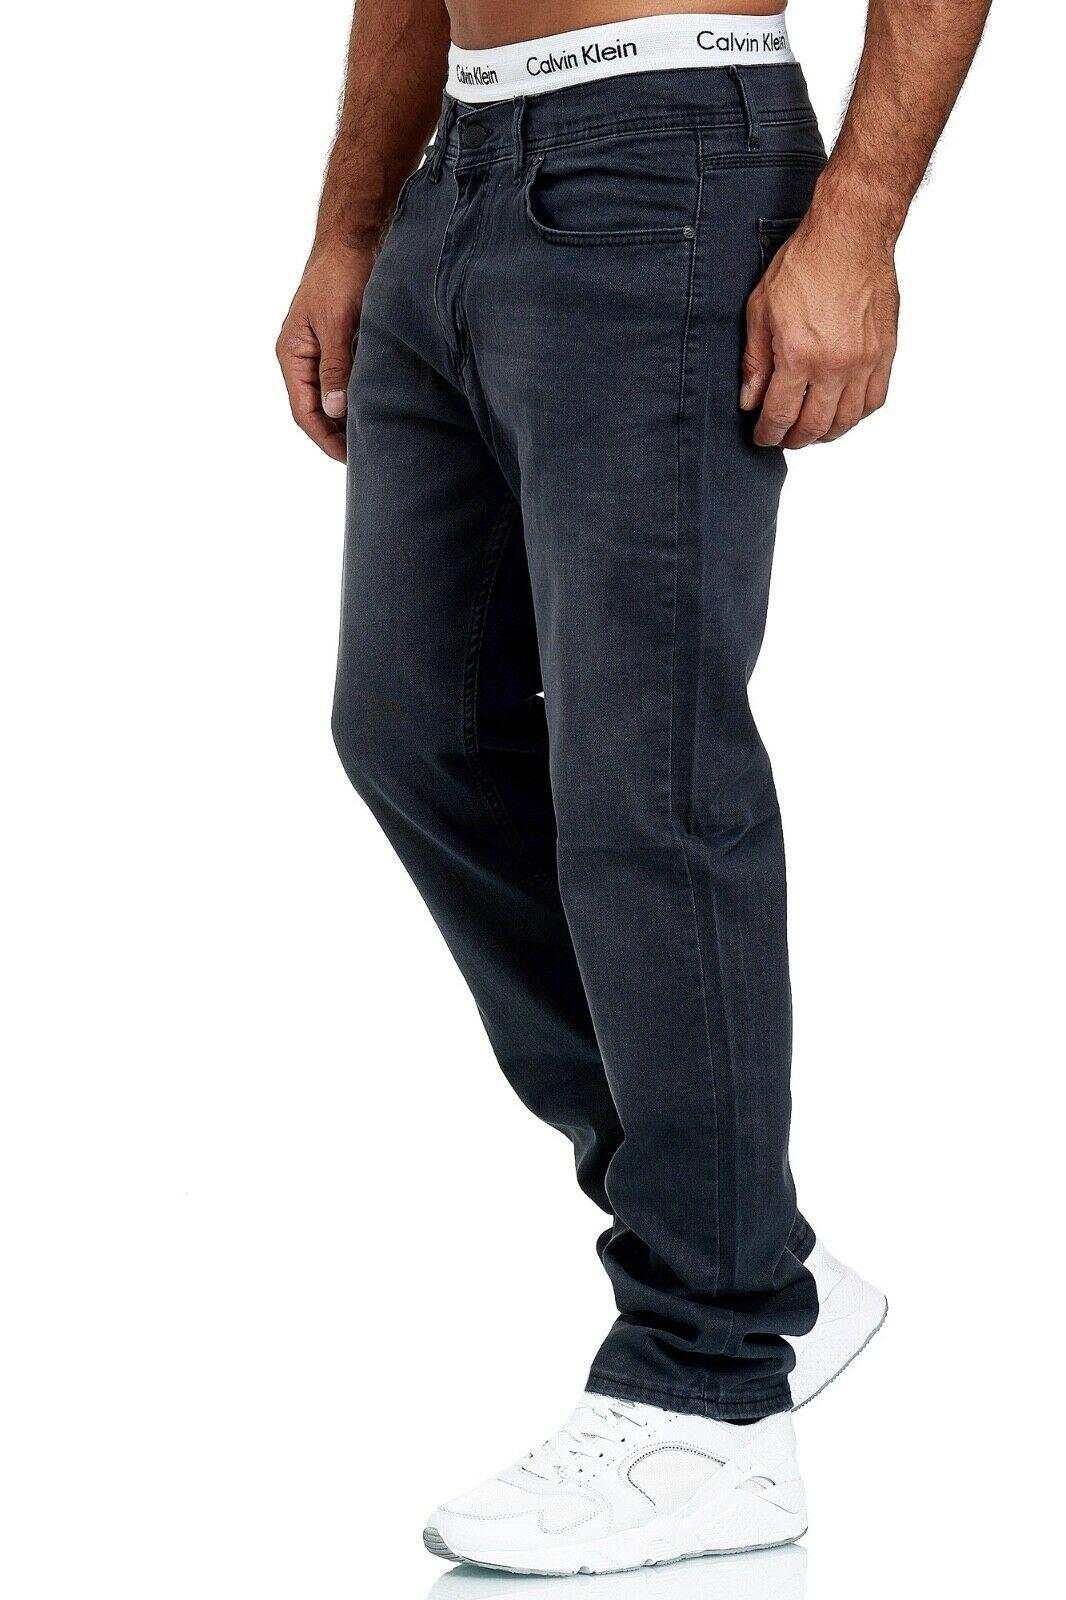 Herren-Jeans-Hose-Denim-KC-Black-Washed-Straight-Cut-Regular-Dicke-Naht-naehte Indexbild 82